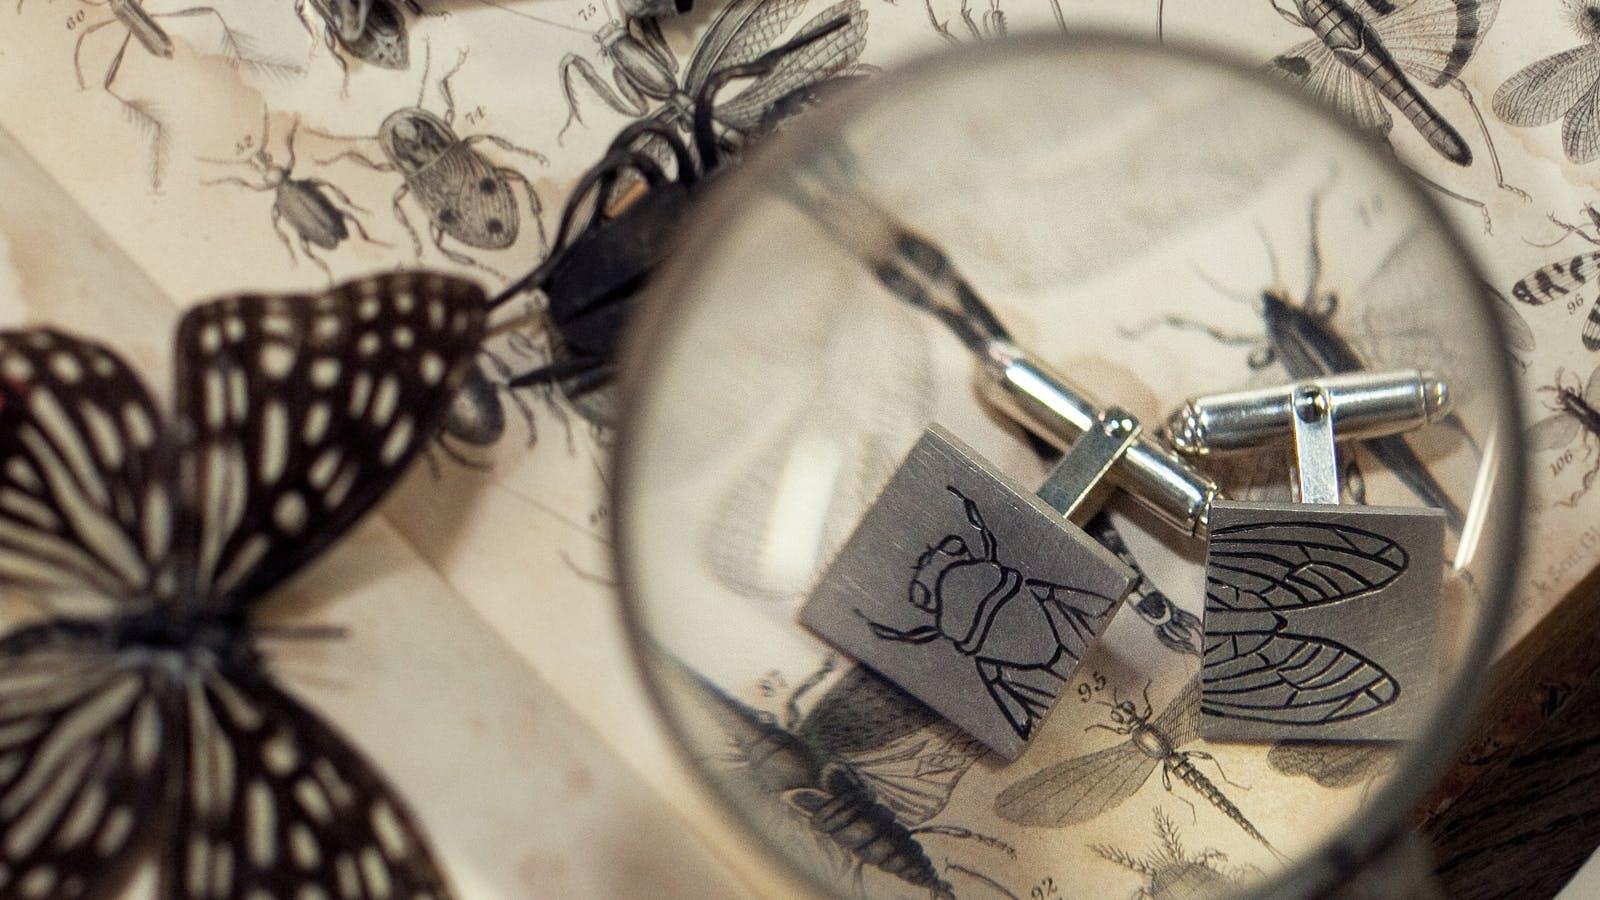 Cicada cufflinks by Katzinka Tschierschky